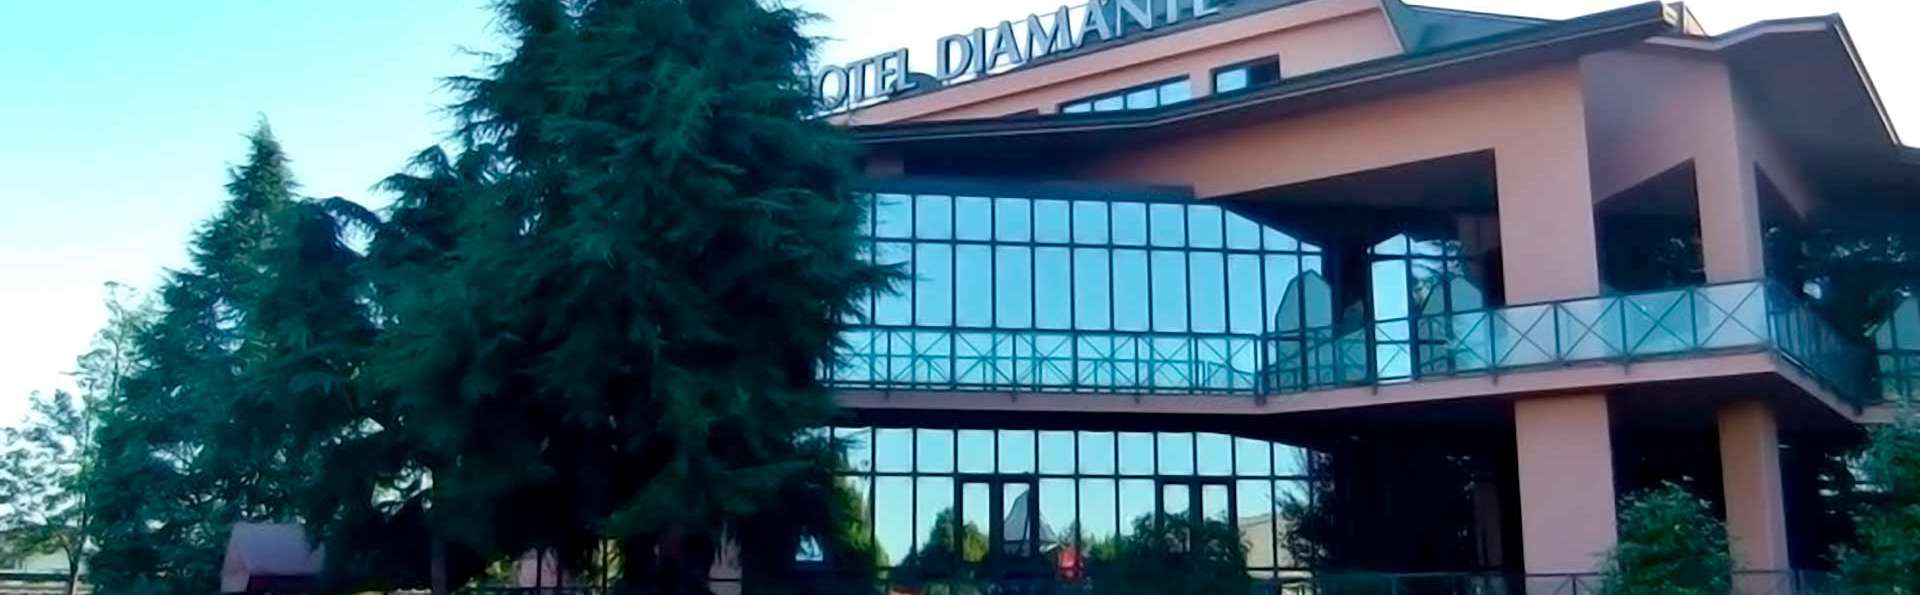 Hotel Diamante - Edit_Front.jpg